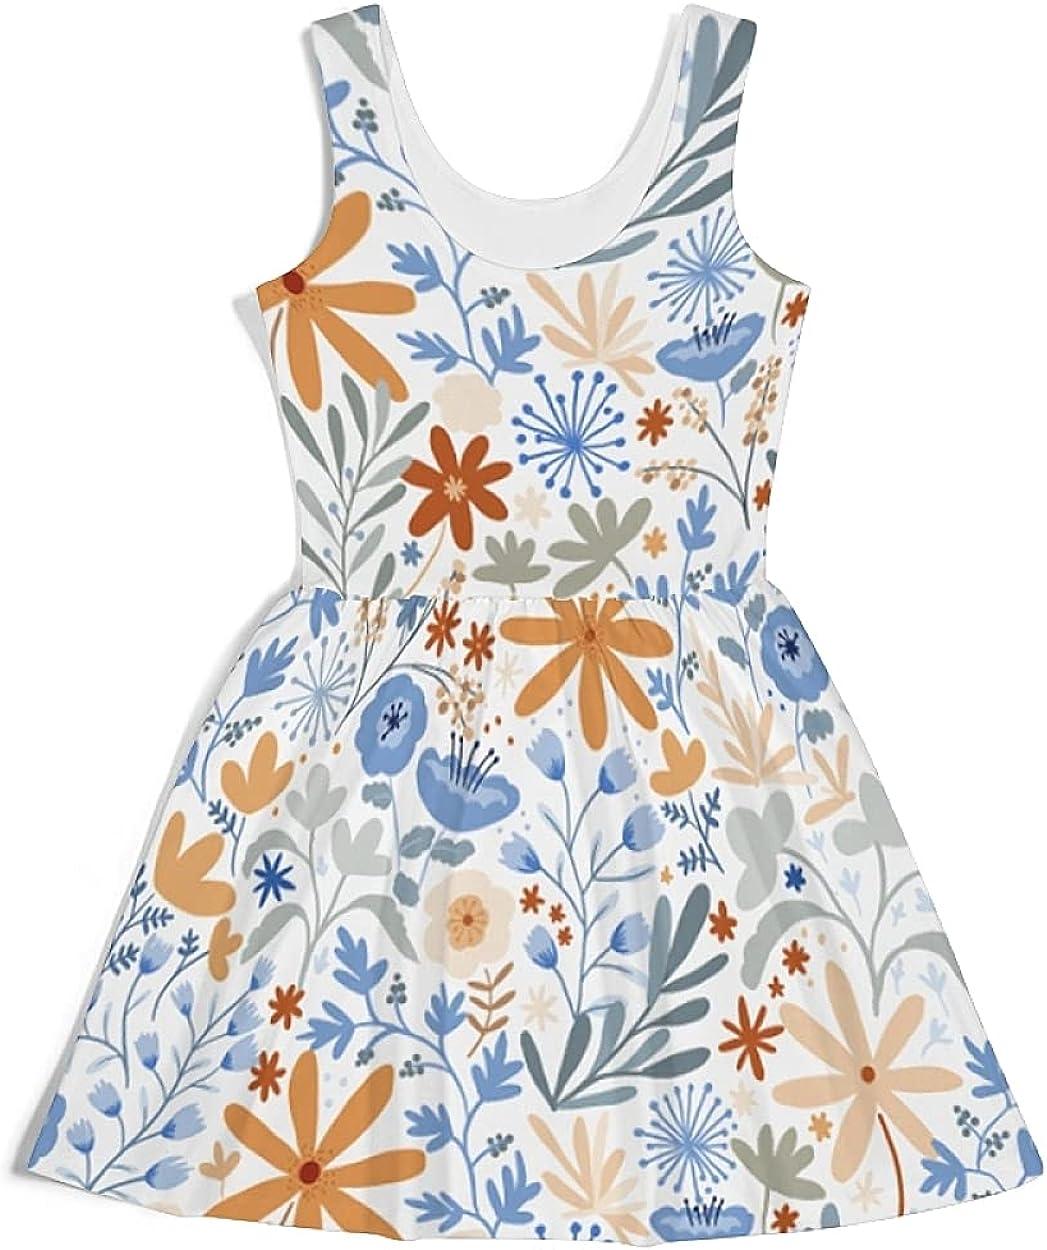 Womens Dress Aesthetic Fashion Skater Dresses Autumn Style Sleeveless Beach Casual Skirt